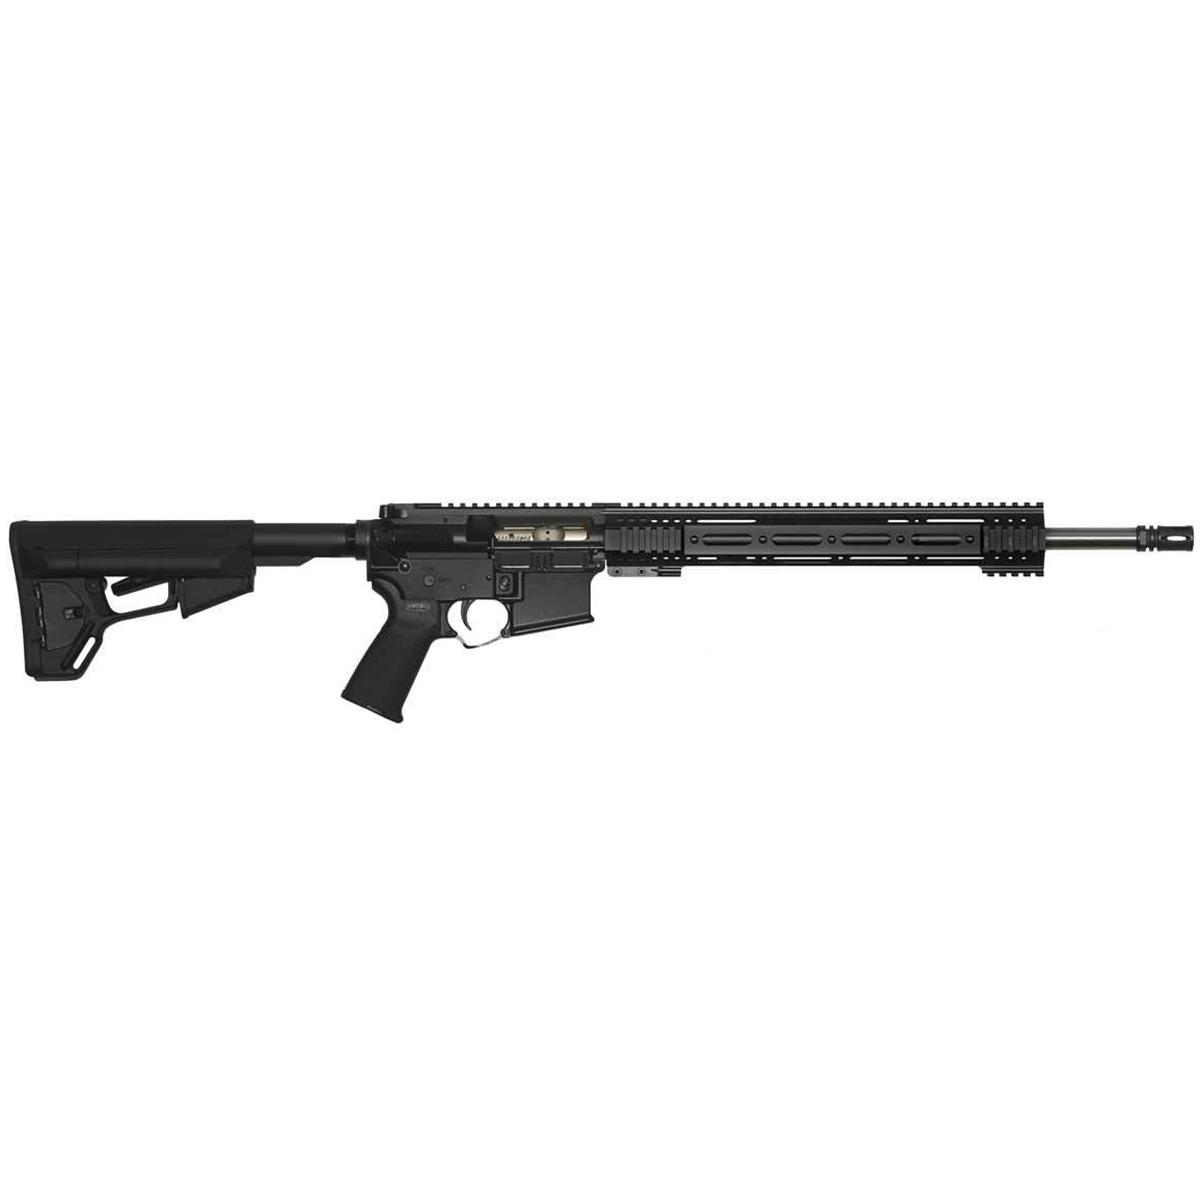 Alex Pro Firearms Tactical Varmint Centerfire Rifle thumbnail